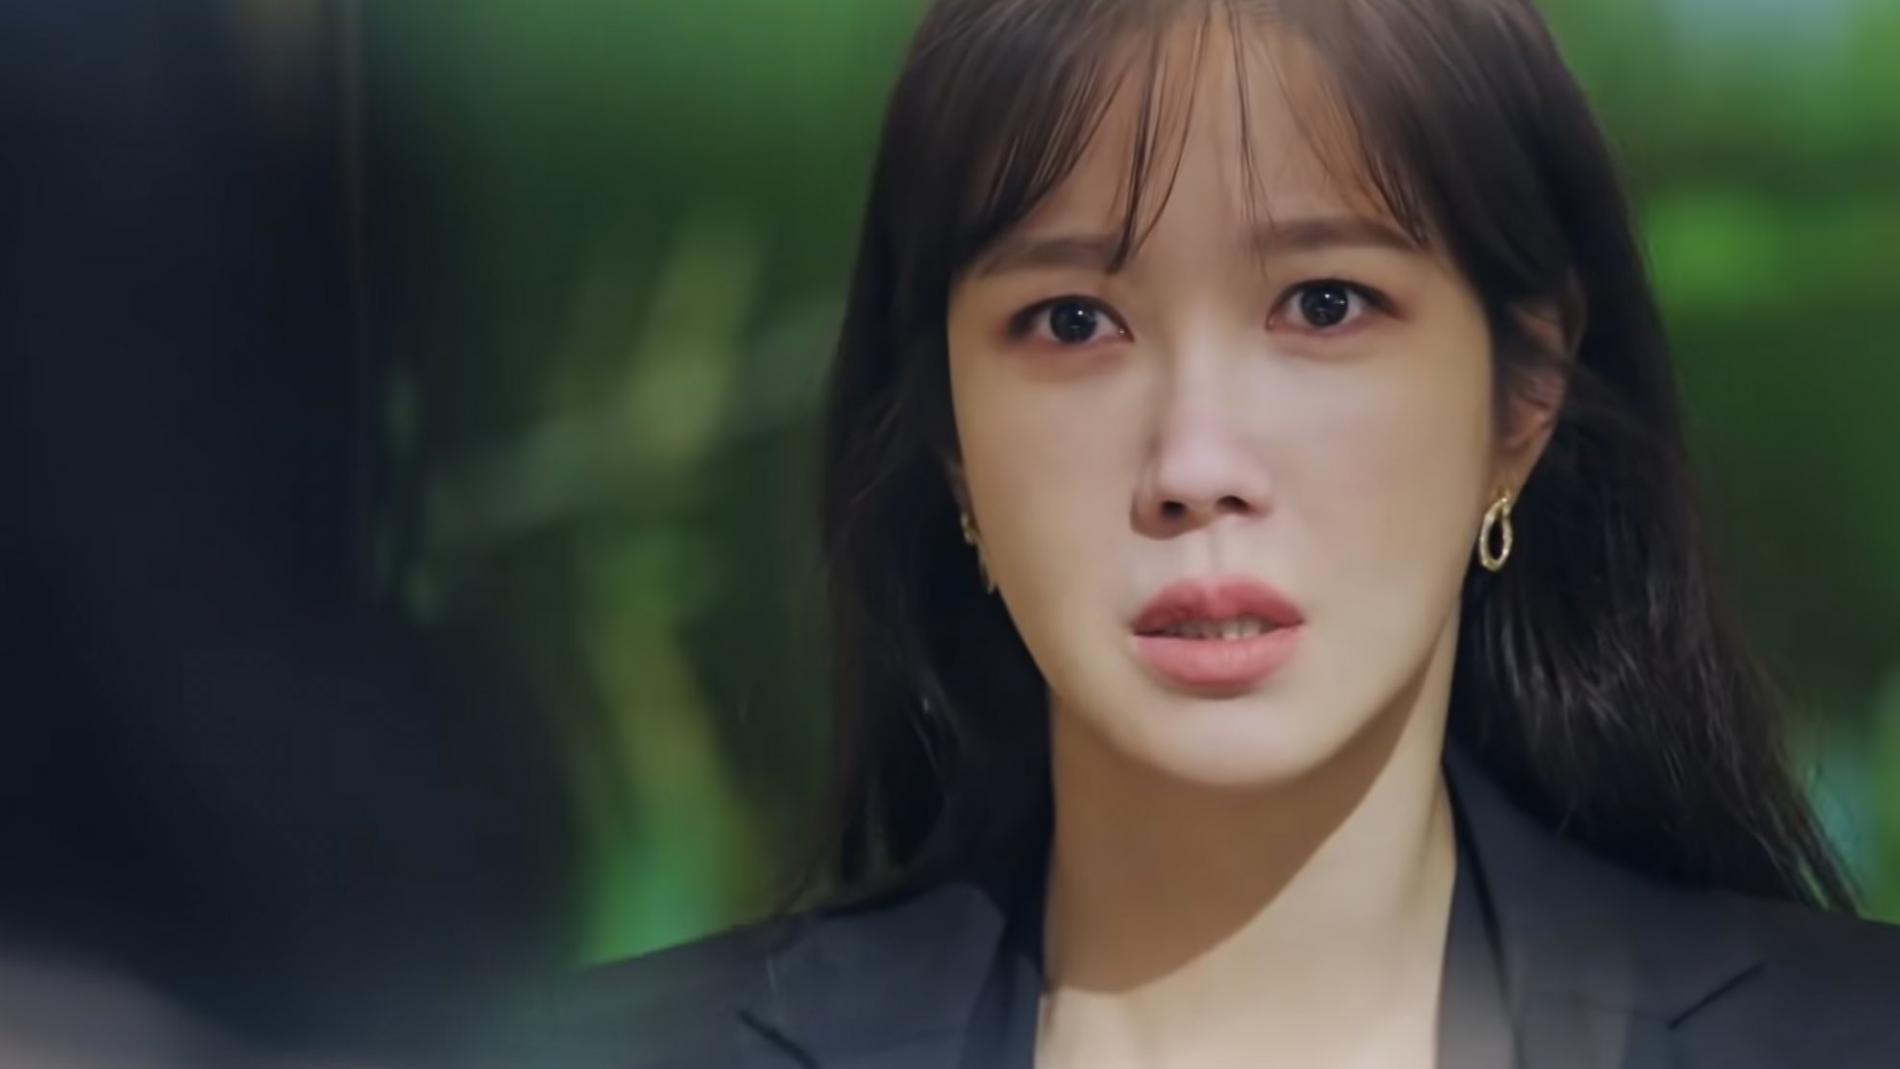 Link Streaming Drama Korea Penthouse 3 Episode 2 Sub Indo, Pembalasan Sim Su Ryeon